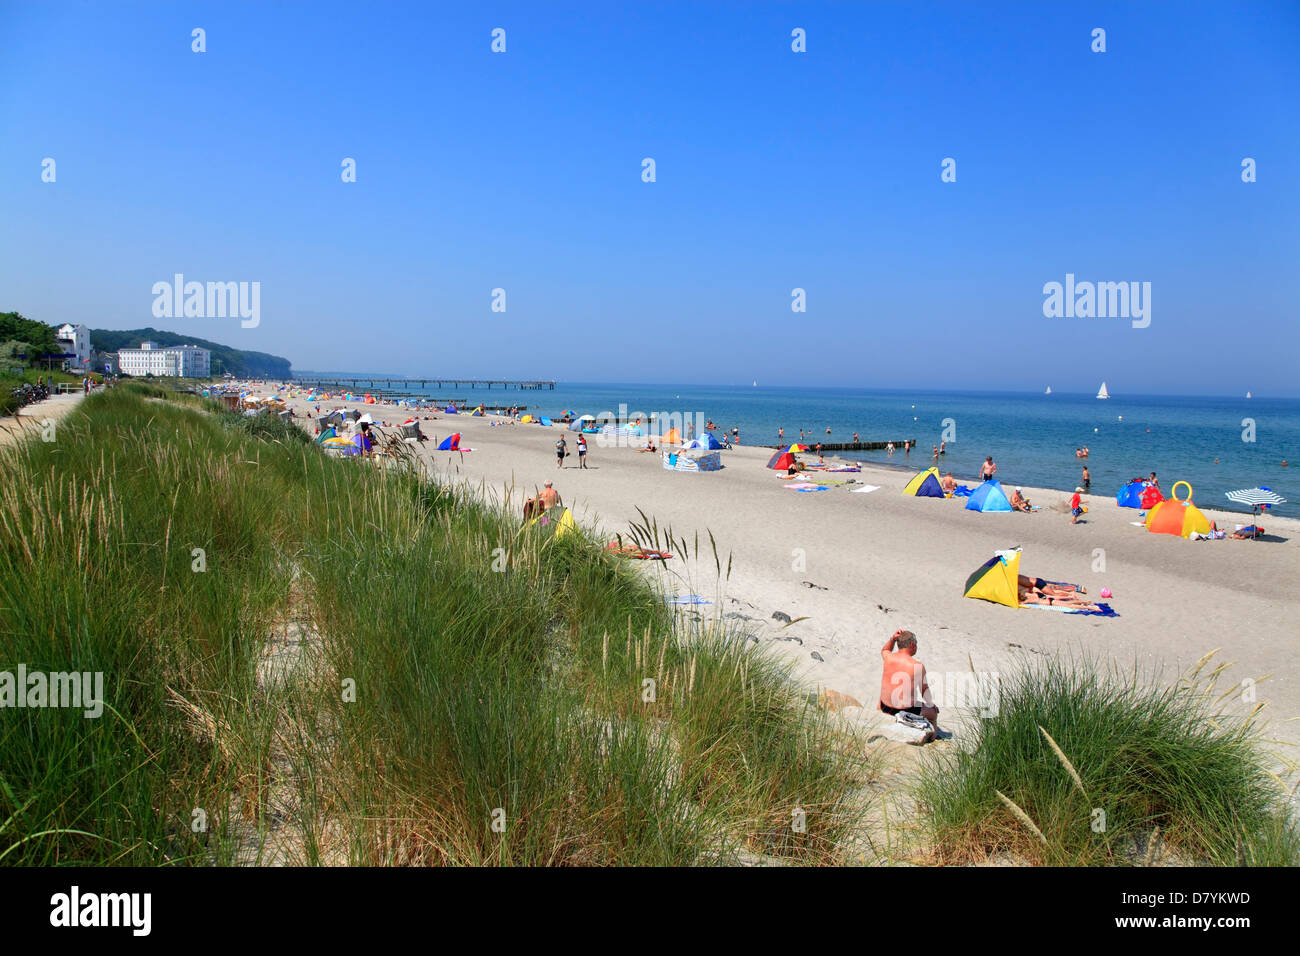 Heiligendamm beach, baltic sea coast, Mecklenburg, Germany - Stock Image